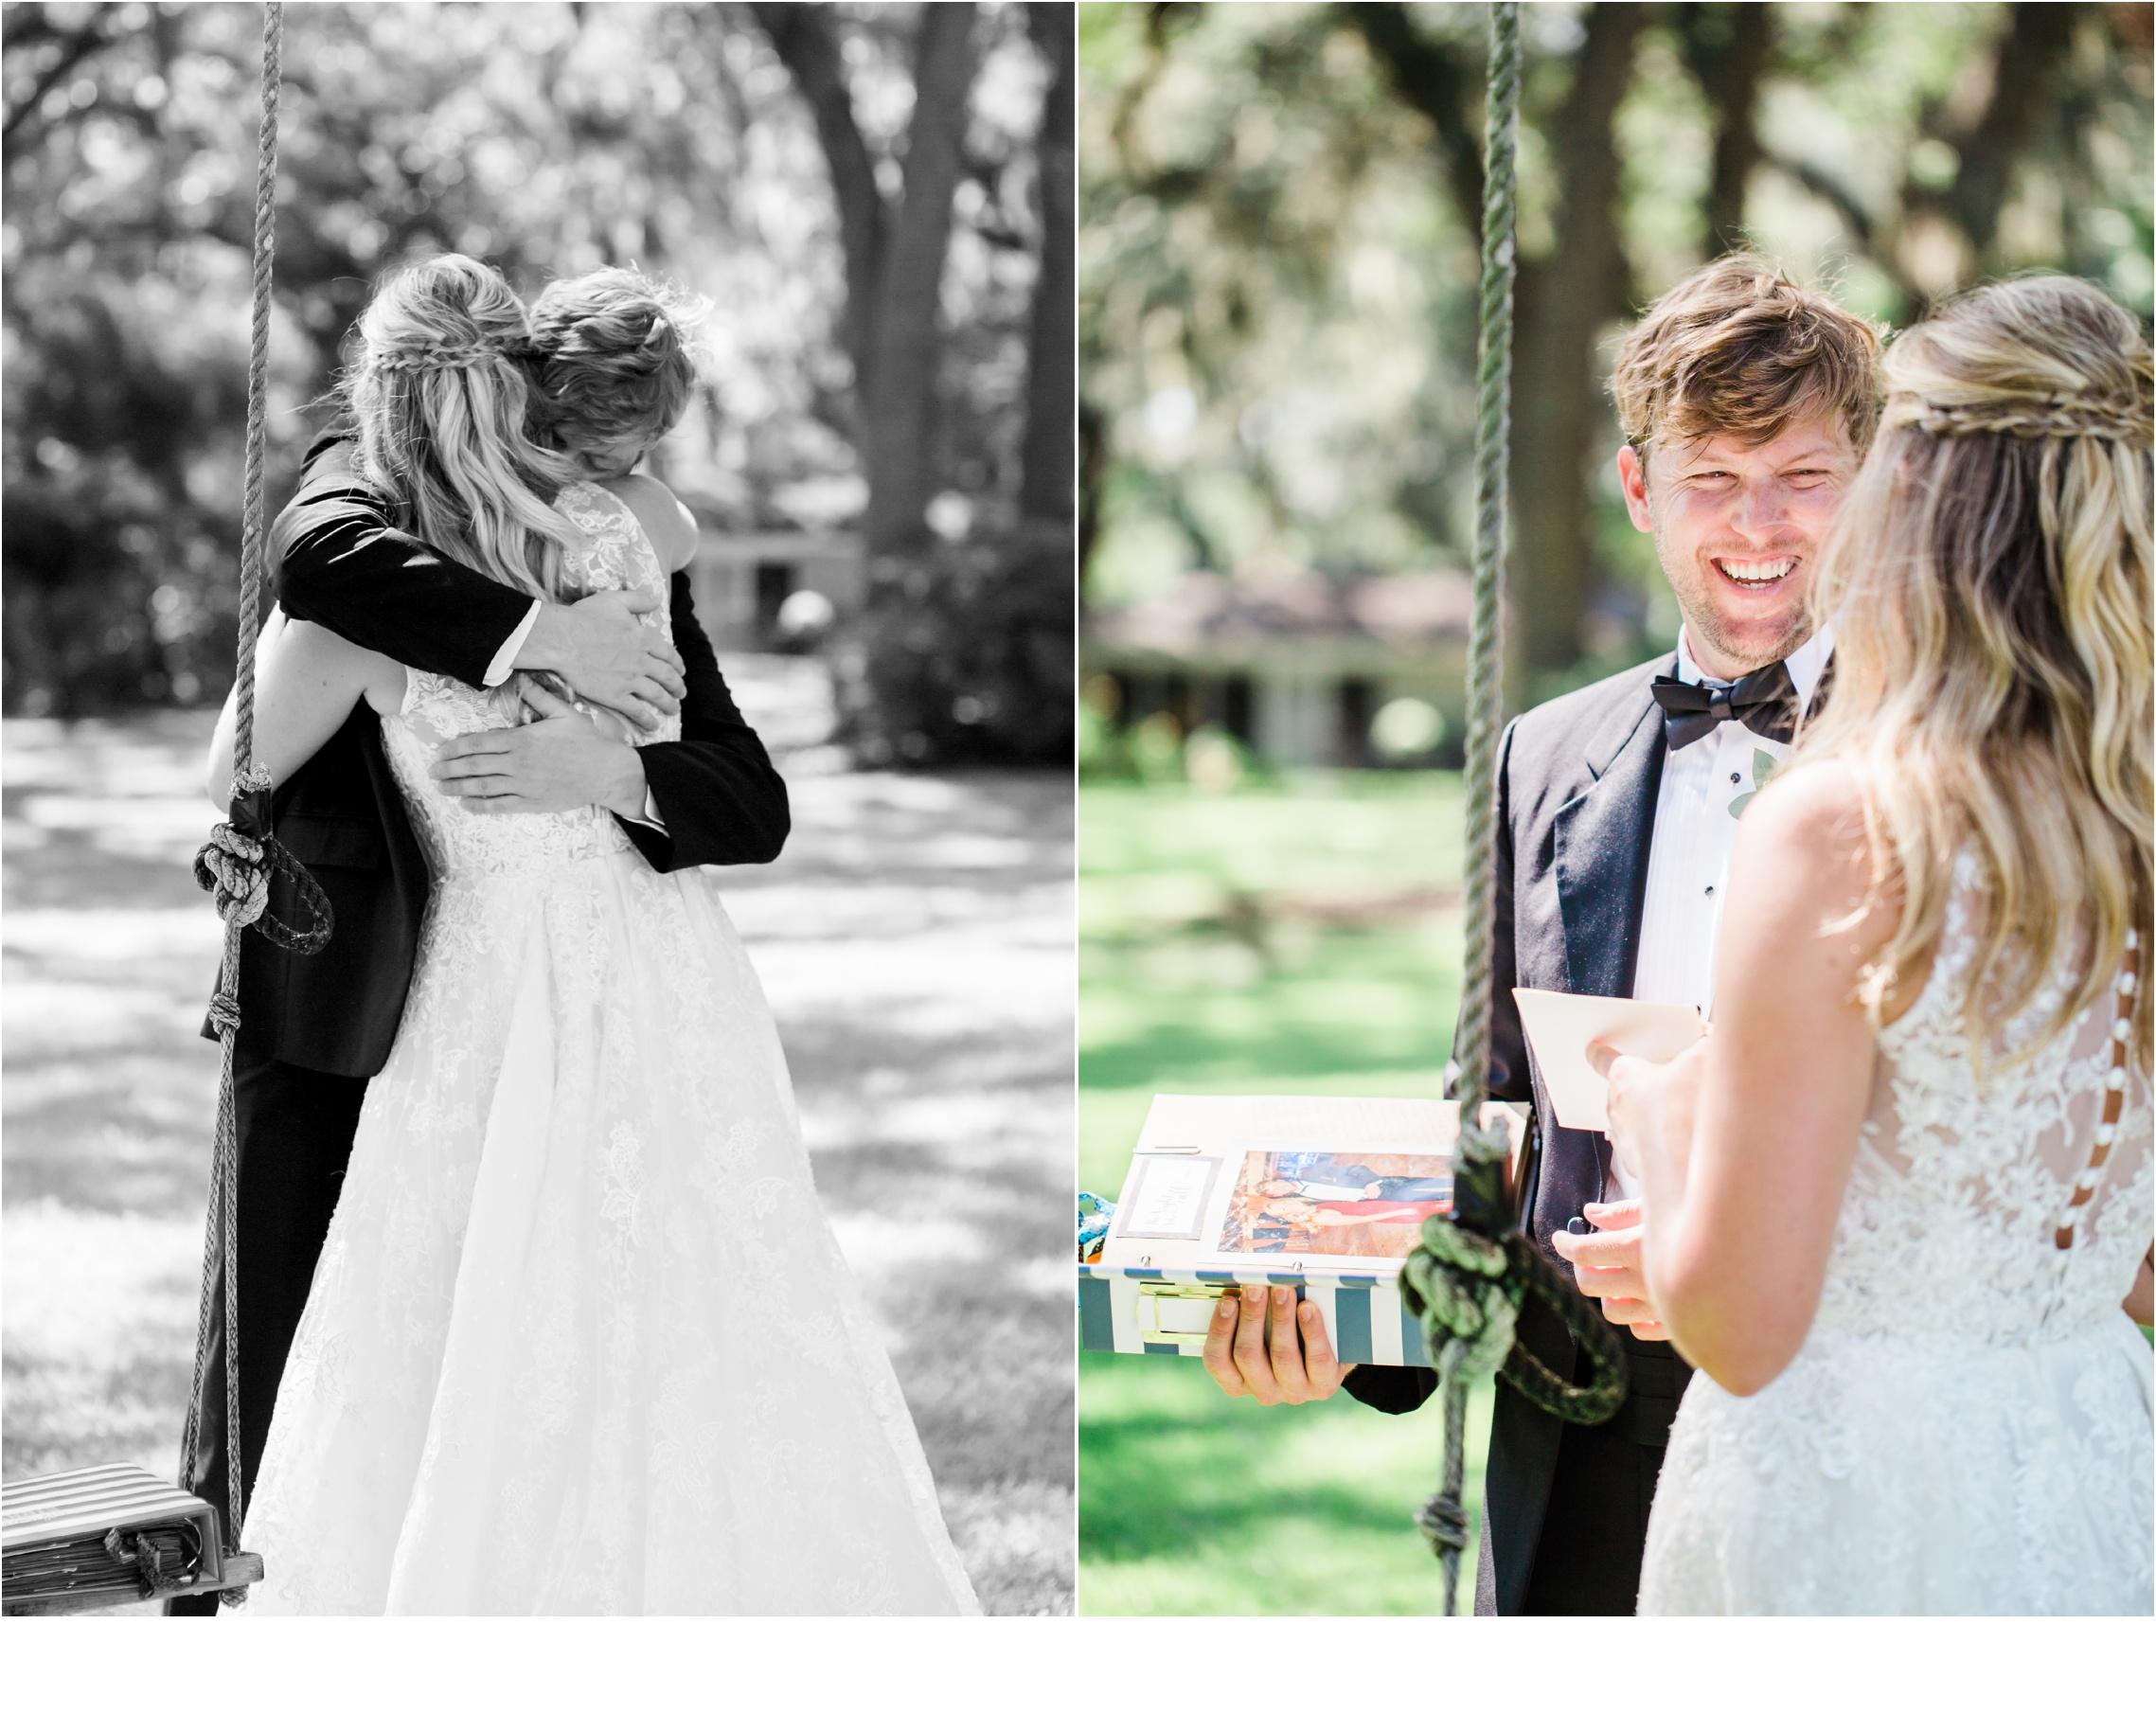 Rainey_Gregg_Photography_St._Simons_Island_Georgia_California_Wedding_Portrait_Photography_0040.jpg